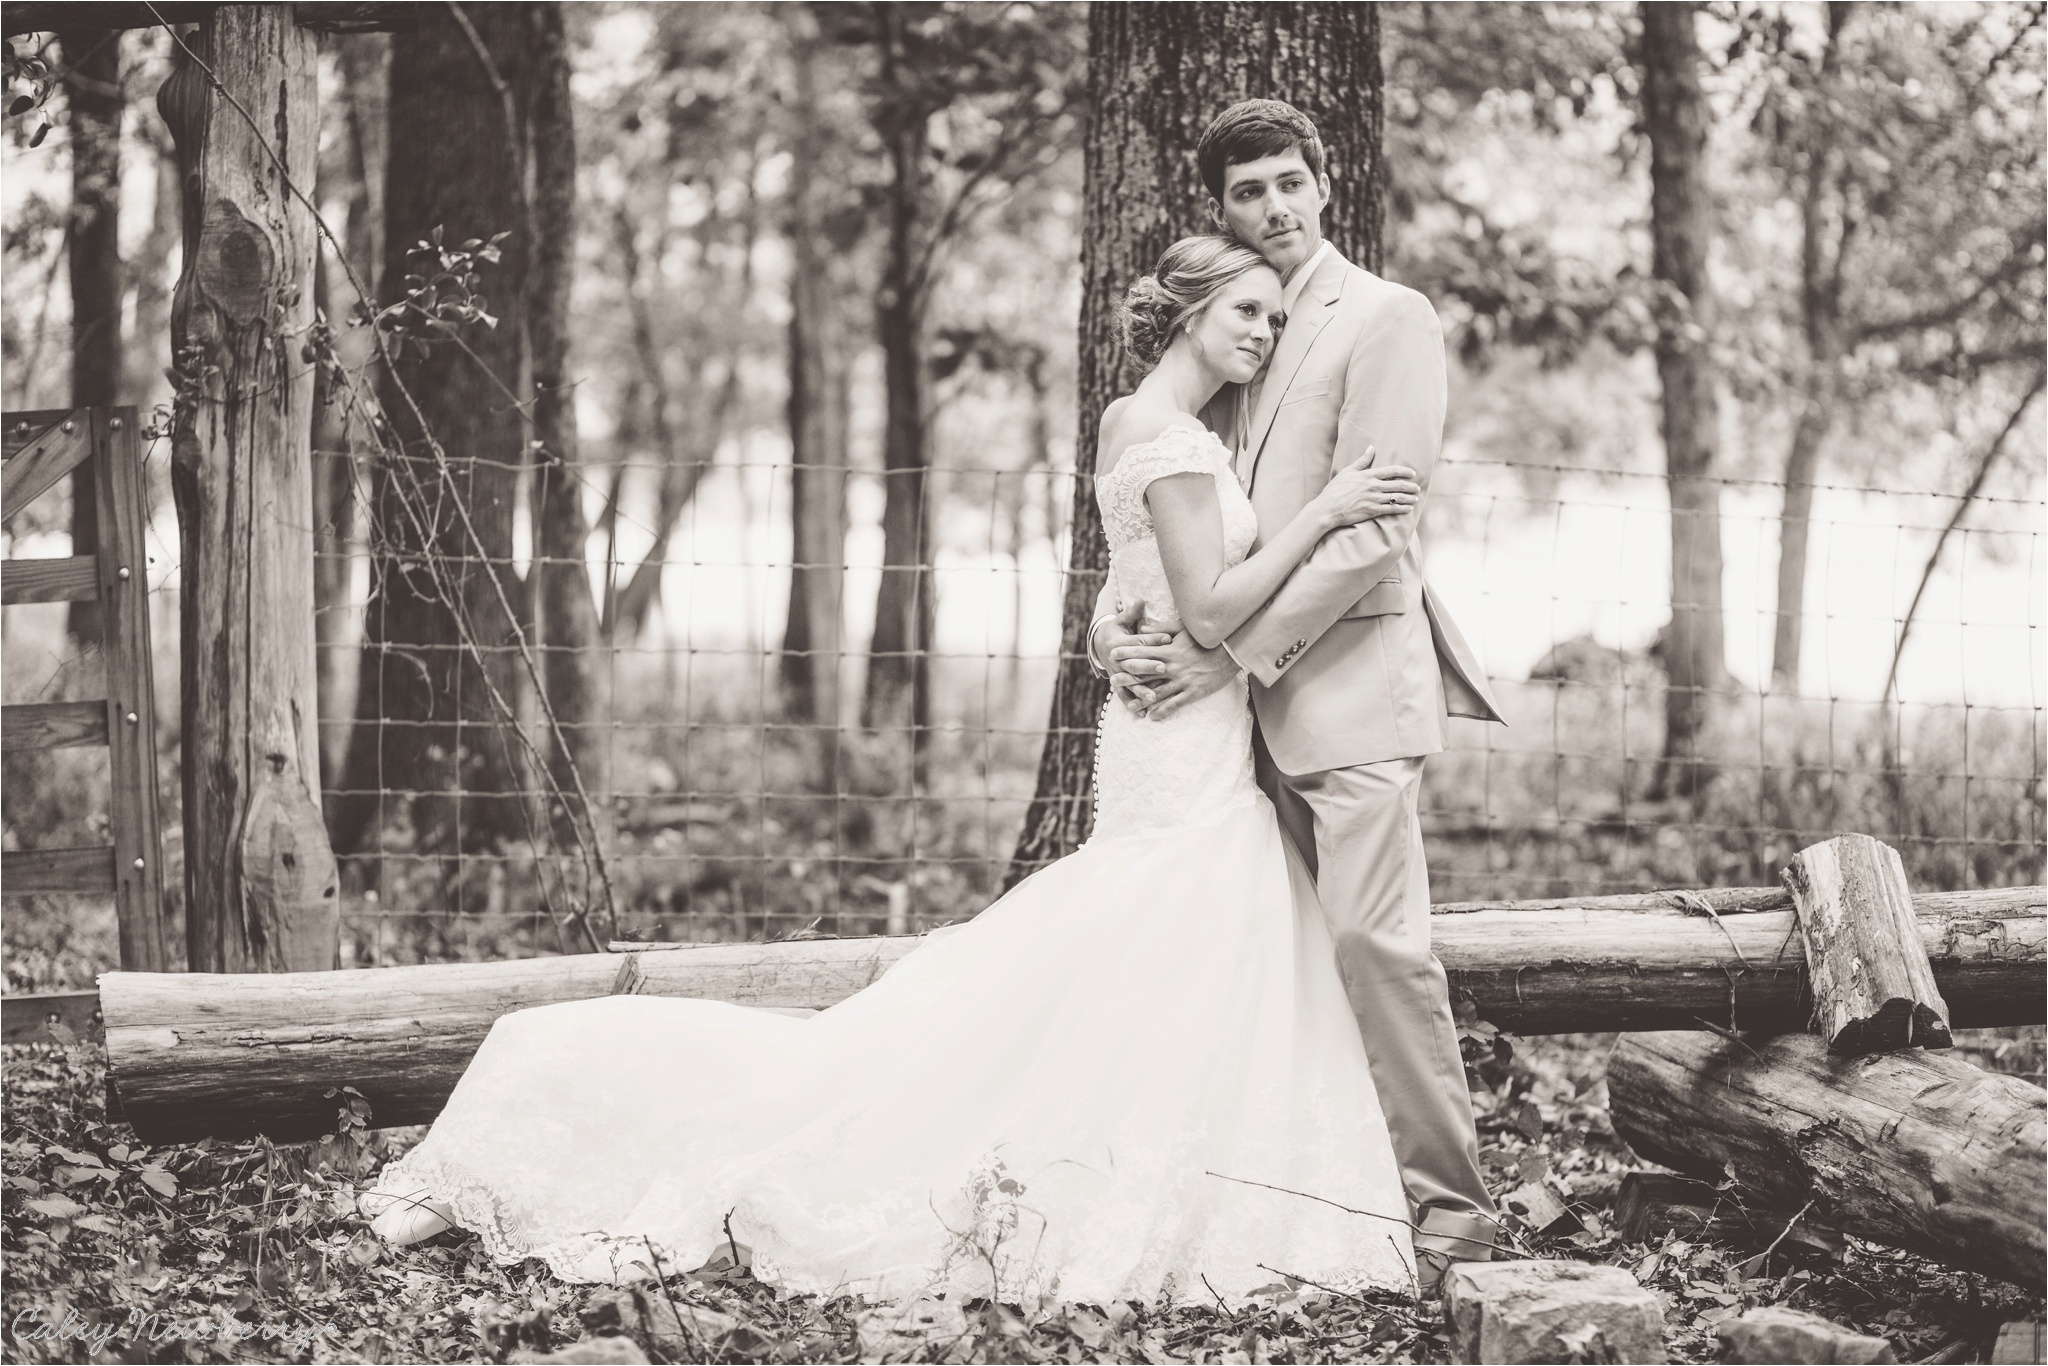 caley-newberry-wedding-photographer-nashville